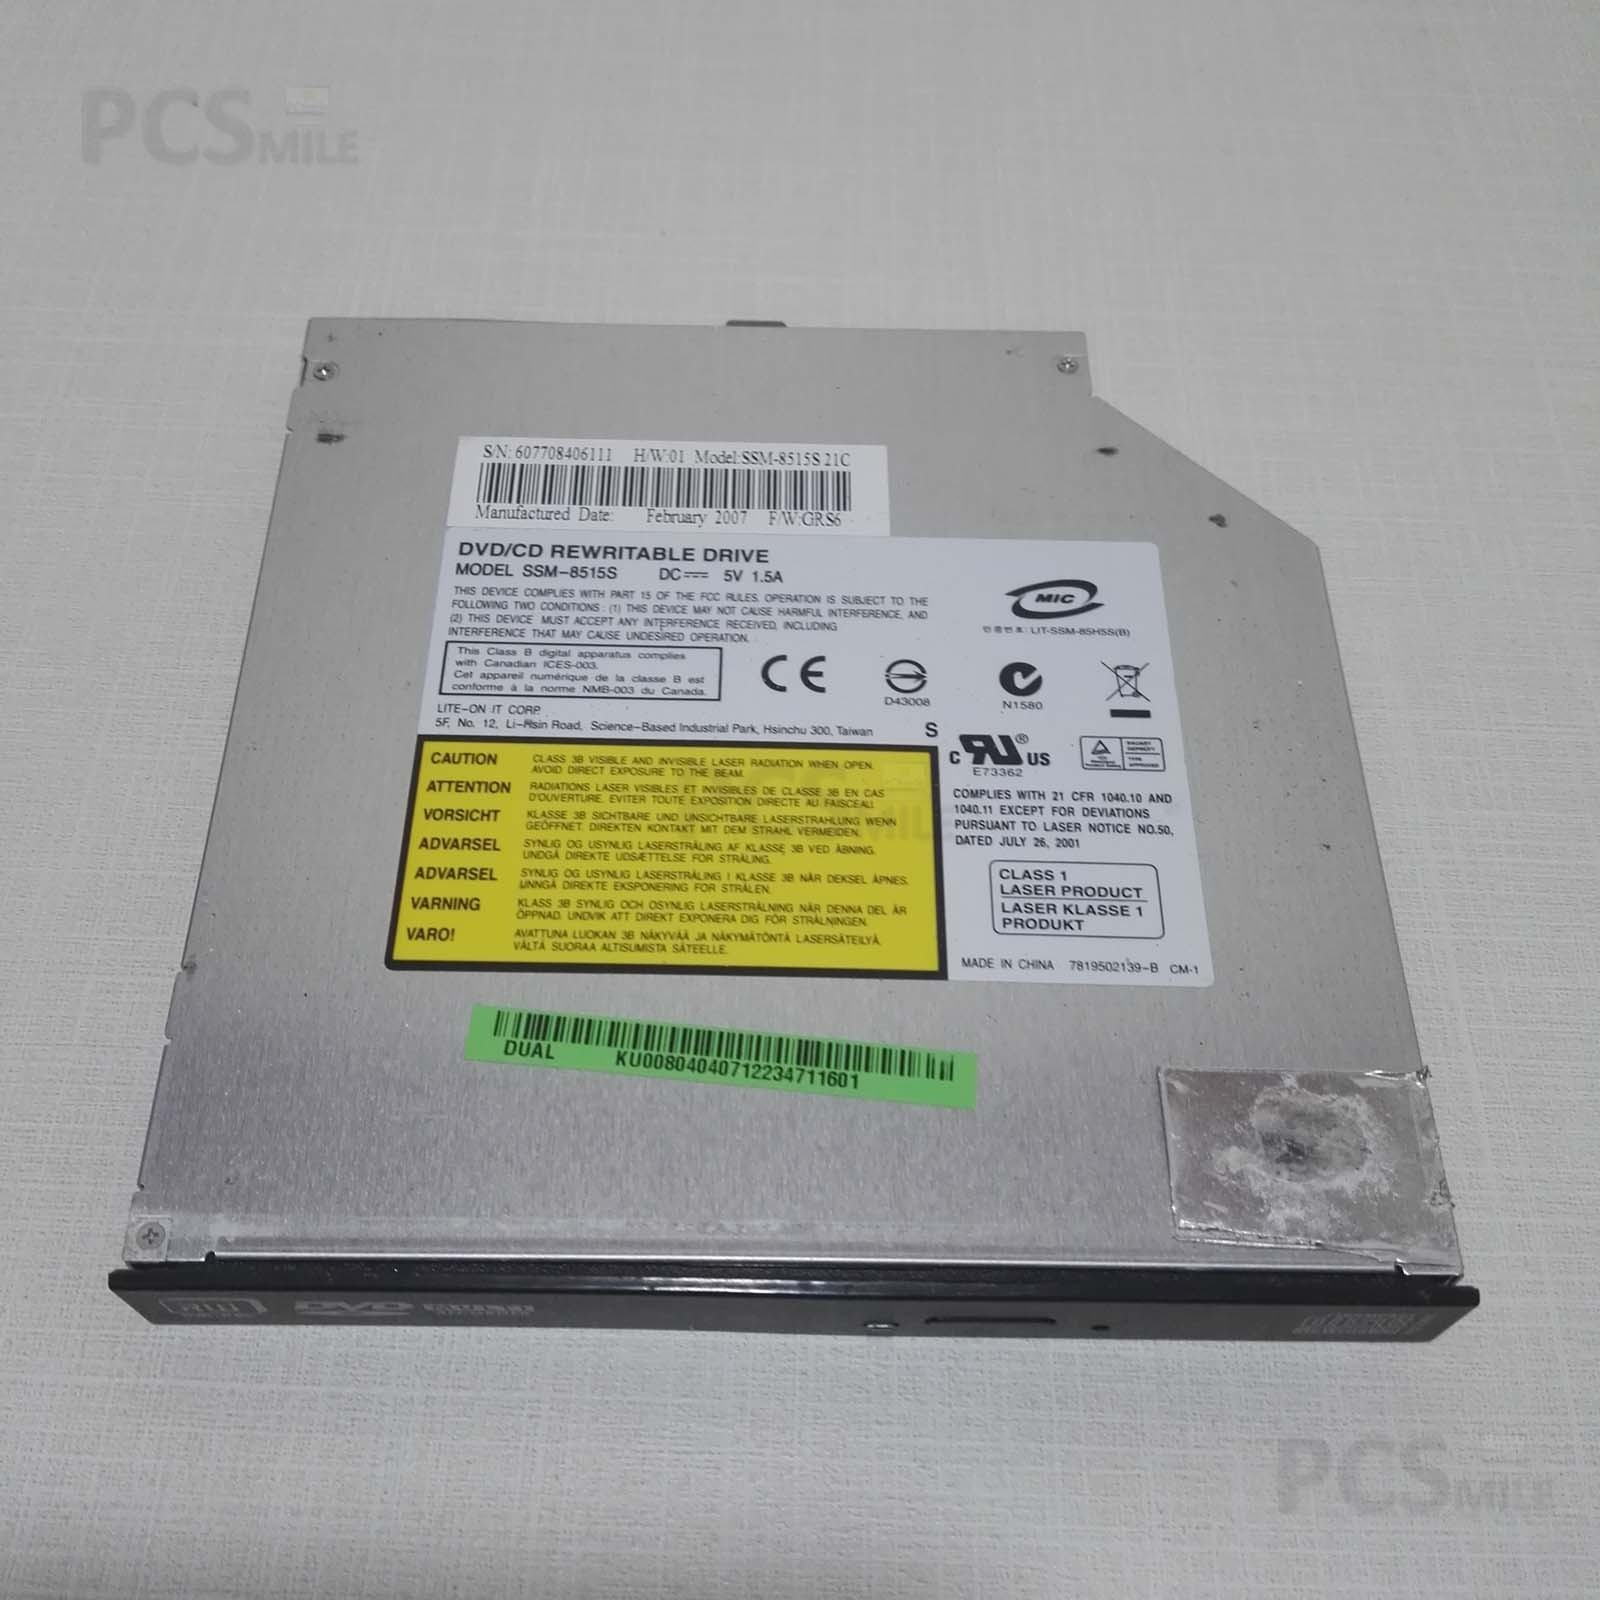 Acer Aspire 5630 bl50 SSM-8515S Lettore CD originale Acer compreso di mascherina